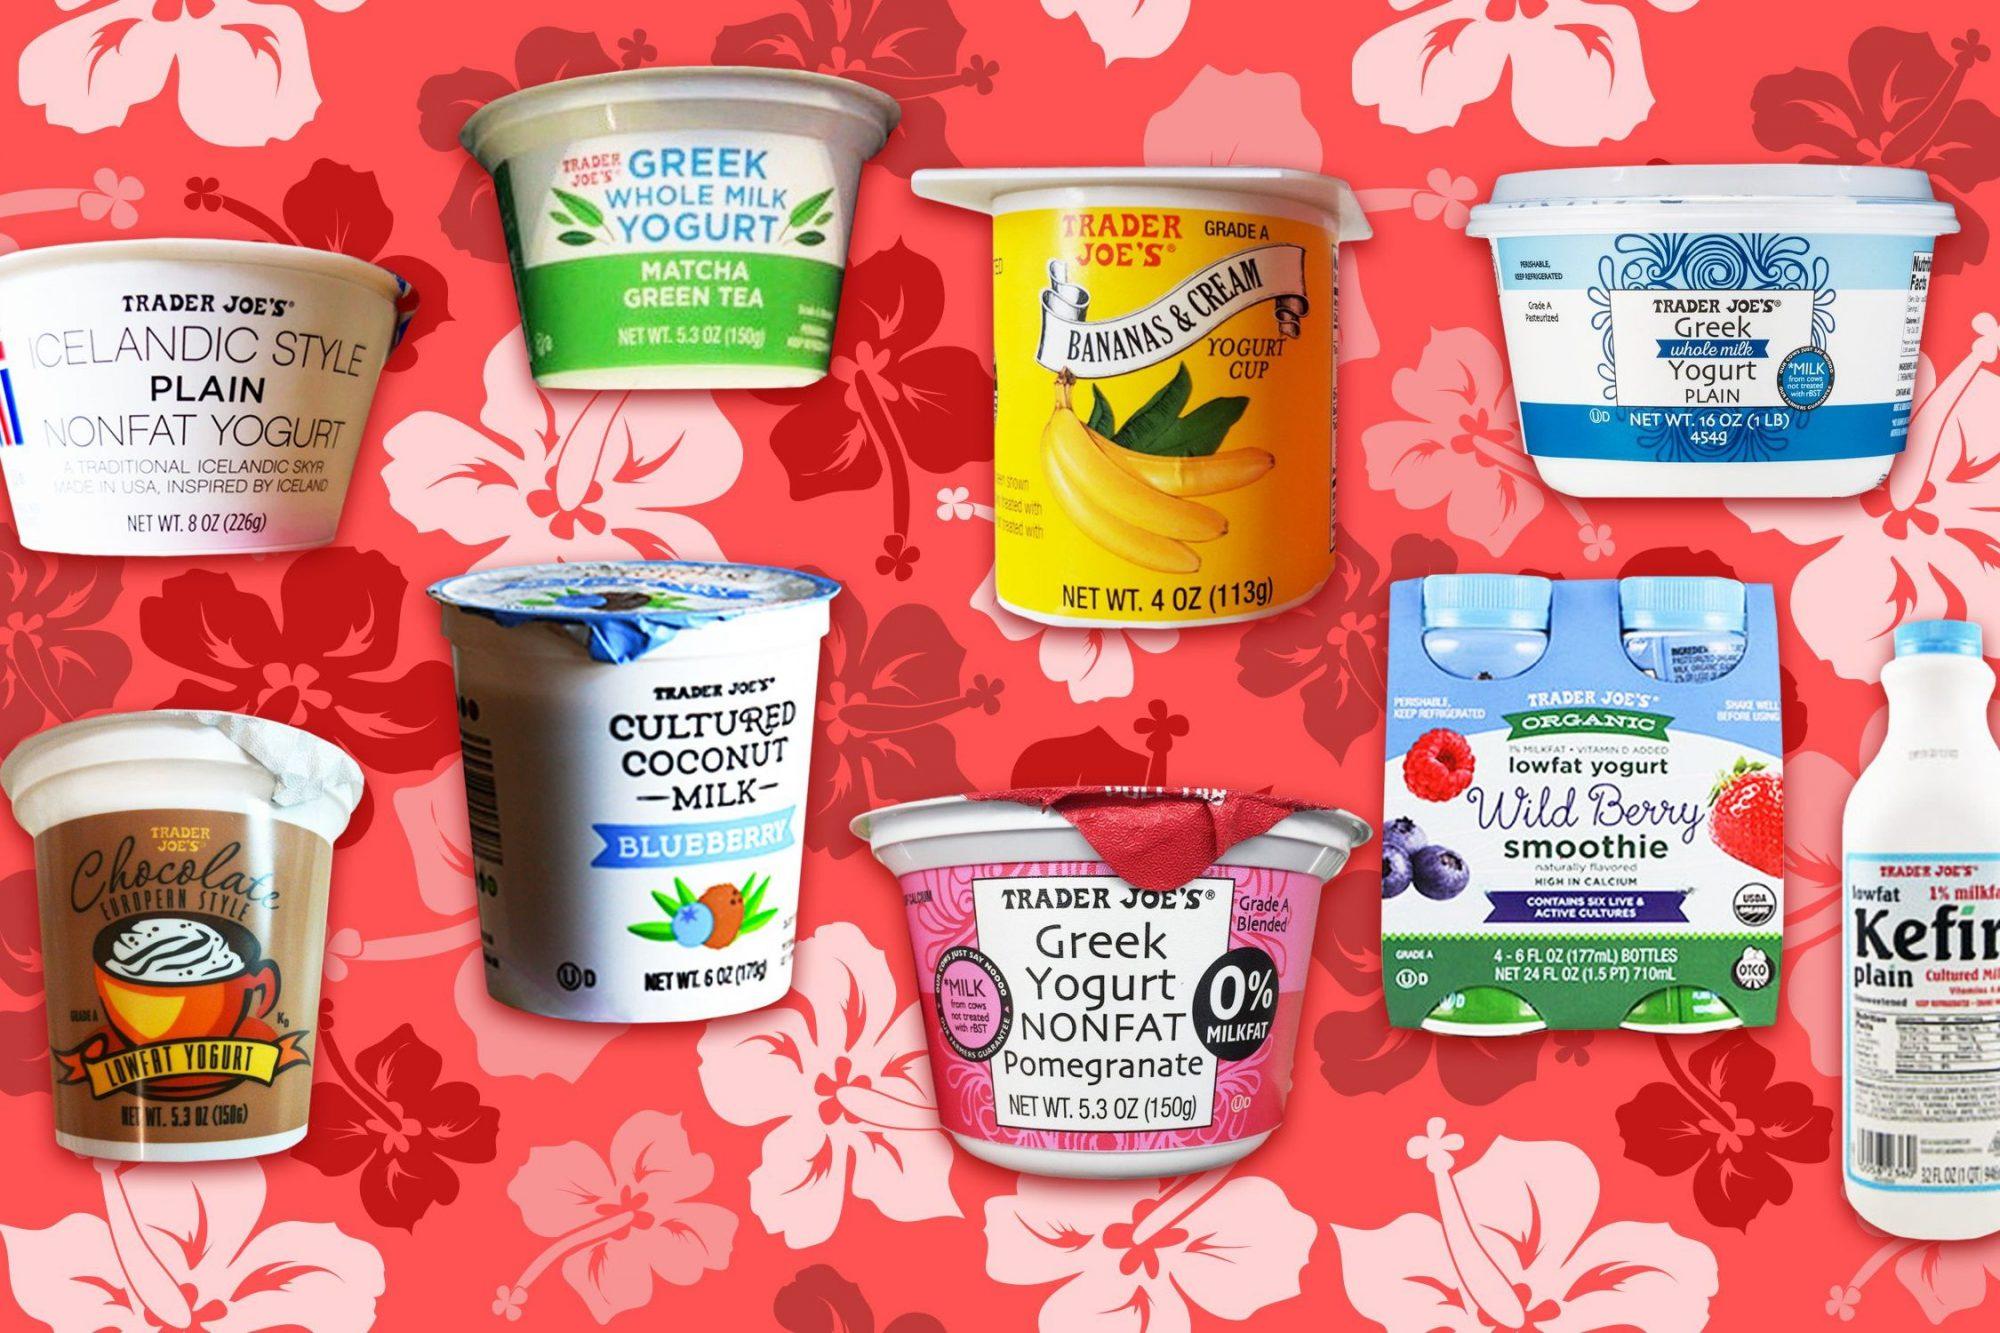 EC: The Best and Worst Trader Joe's Yogurts